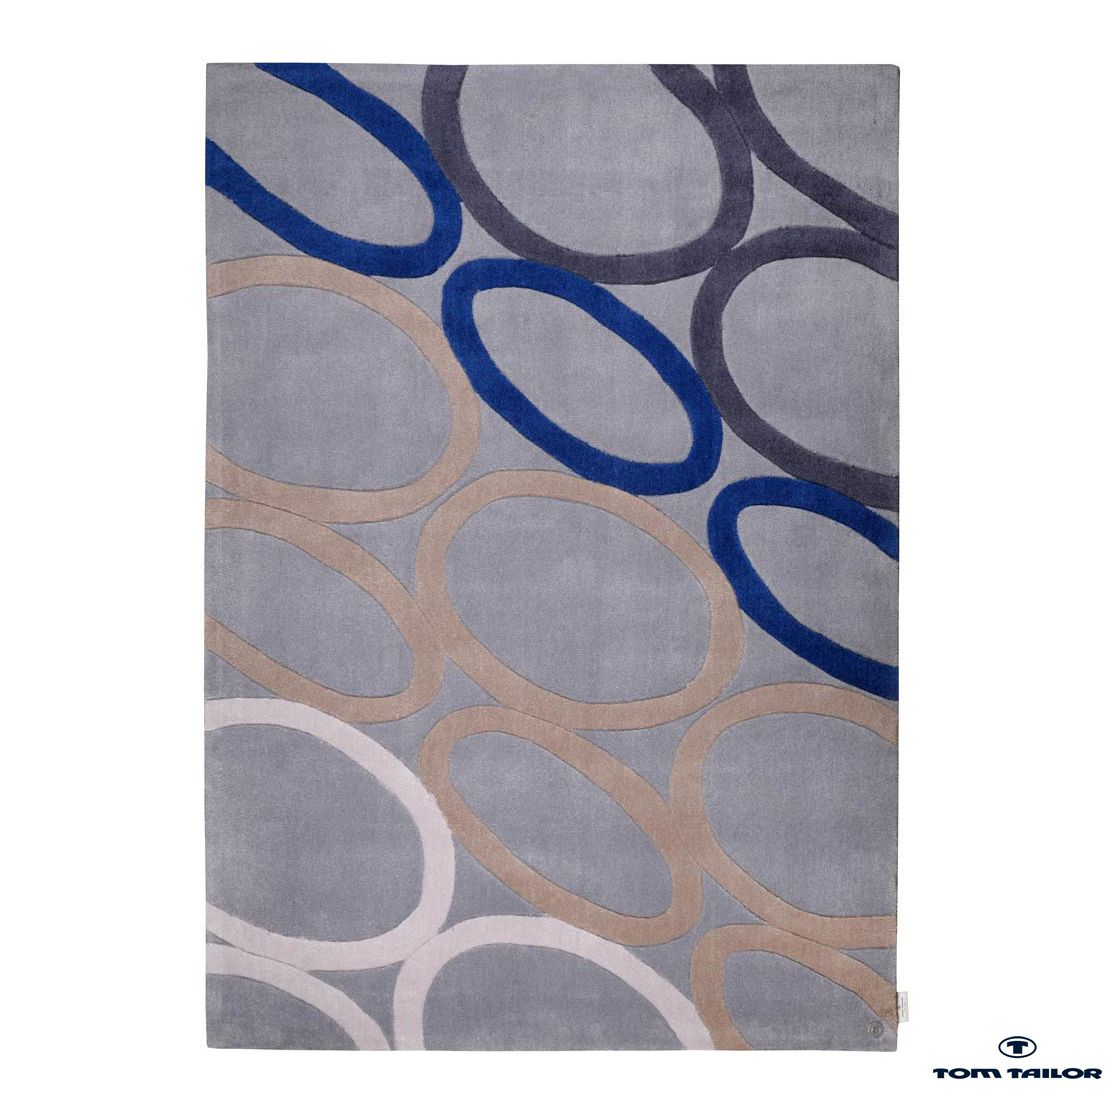 Teppich Oval – blue – 160x230cm, Tom Tailor kaufen